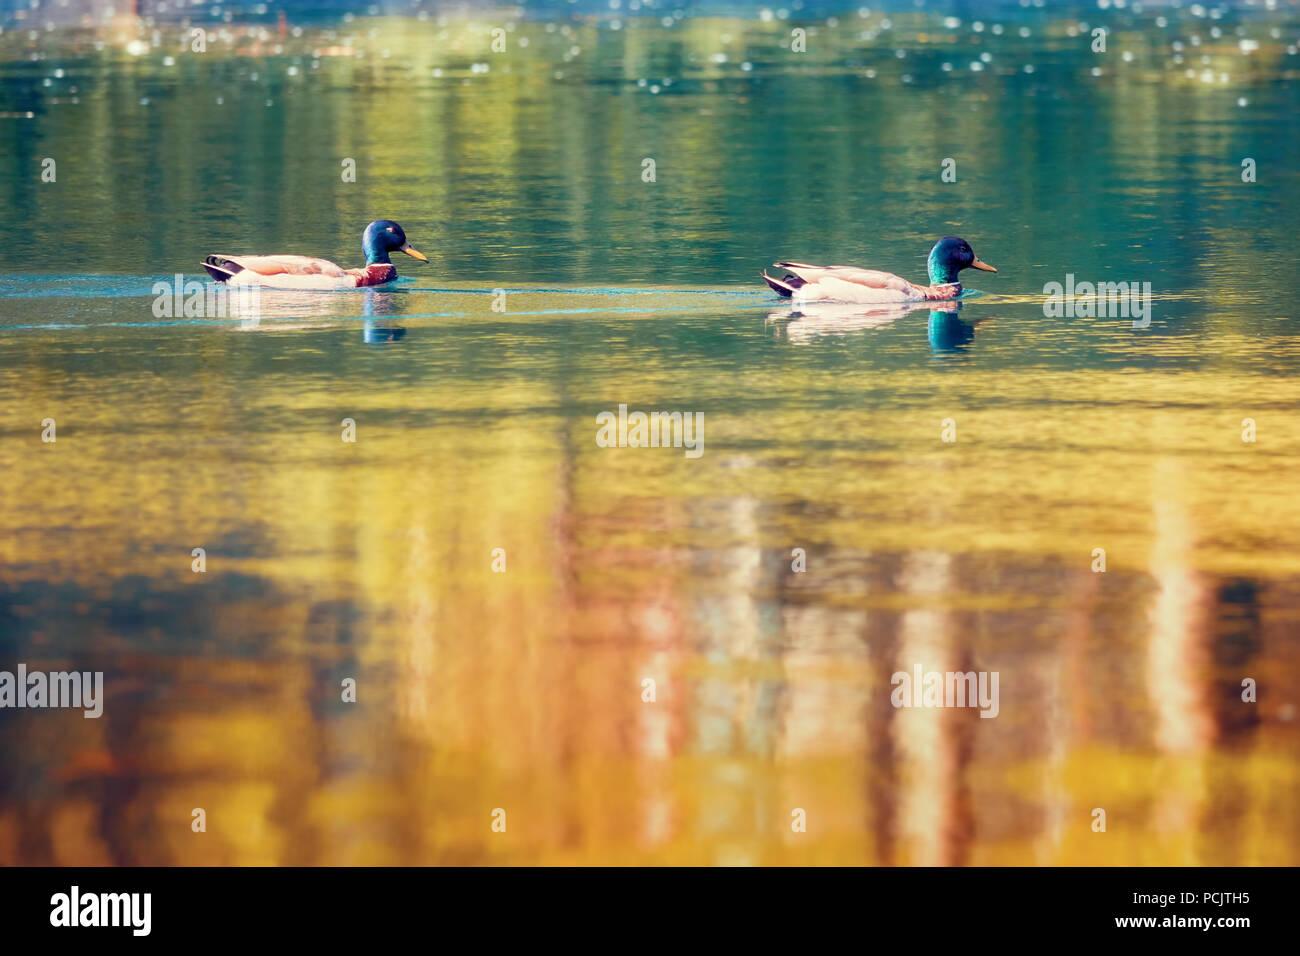 Two duck mallards Anas platyrhynchos anatidae swimming on a golden pond - Stock Image